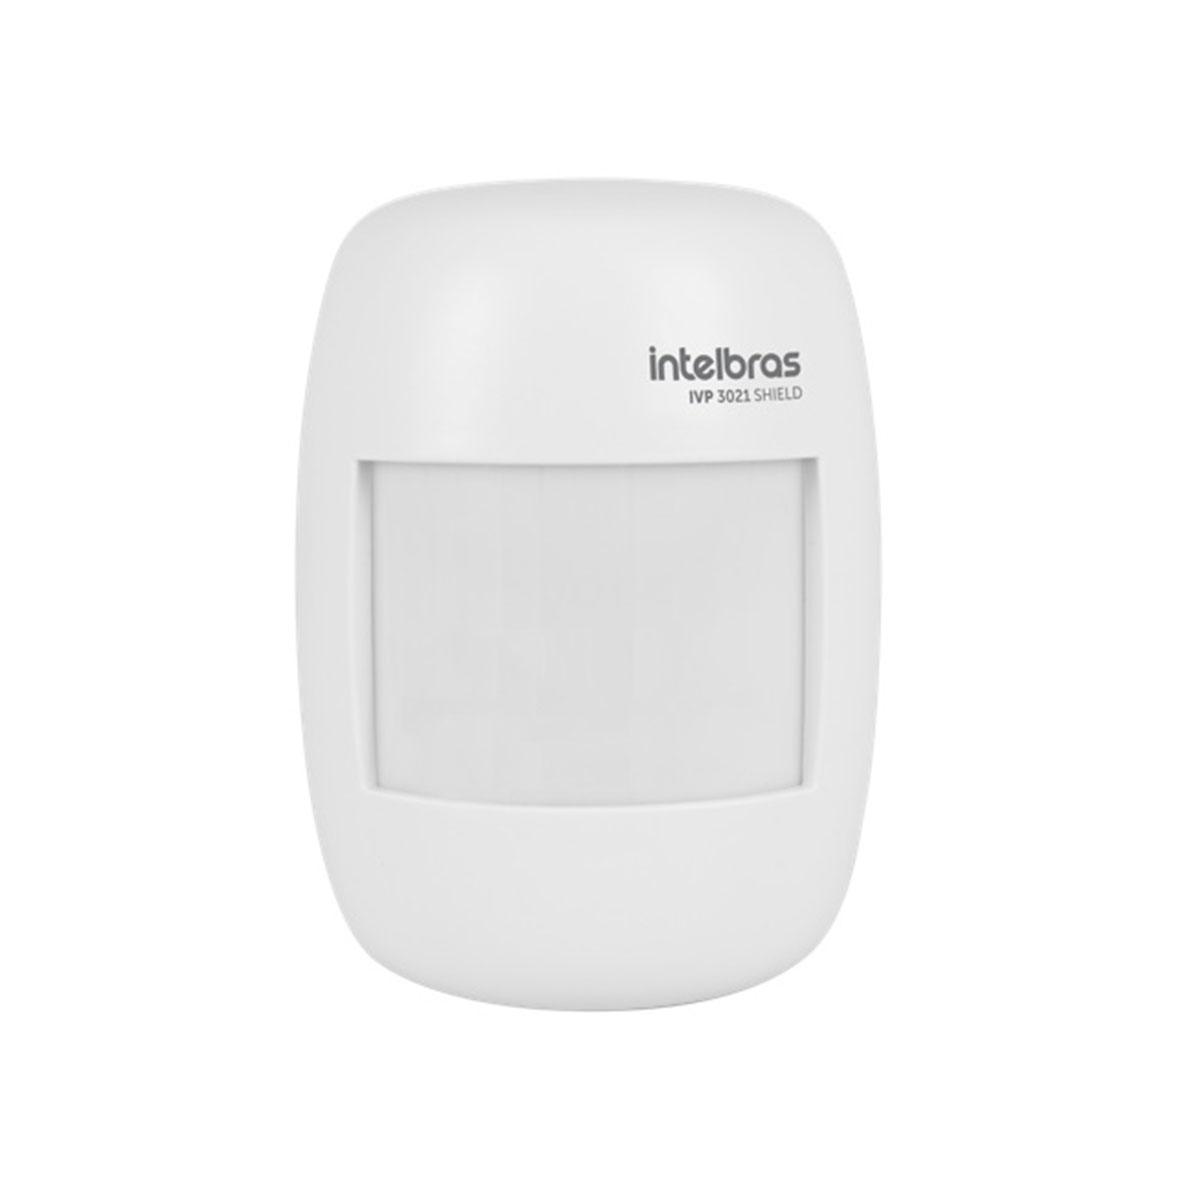 Kit 06 Sensor Interno Com Fio Intelbras Ivp 3021 Shield